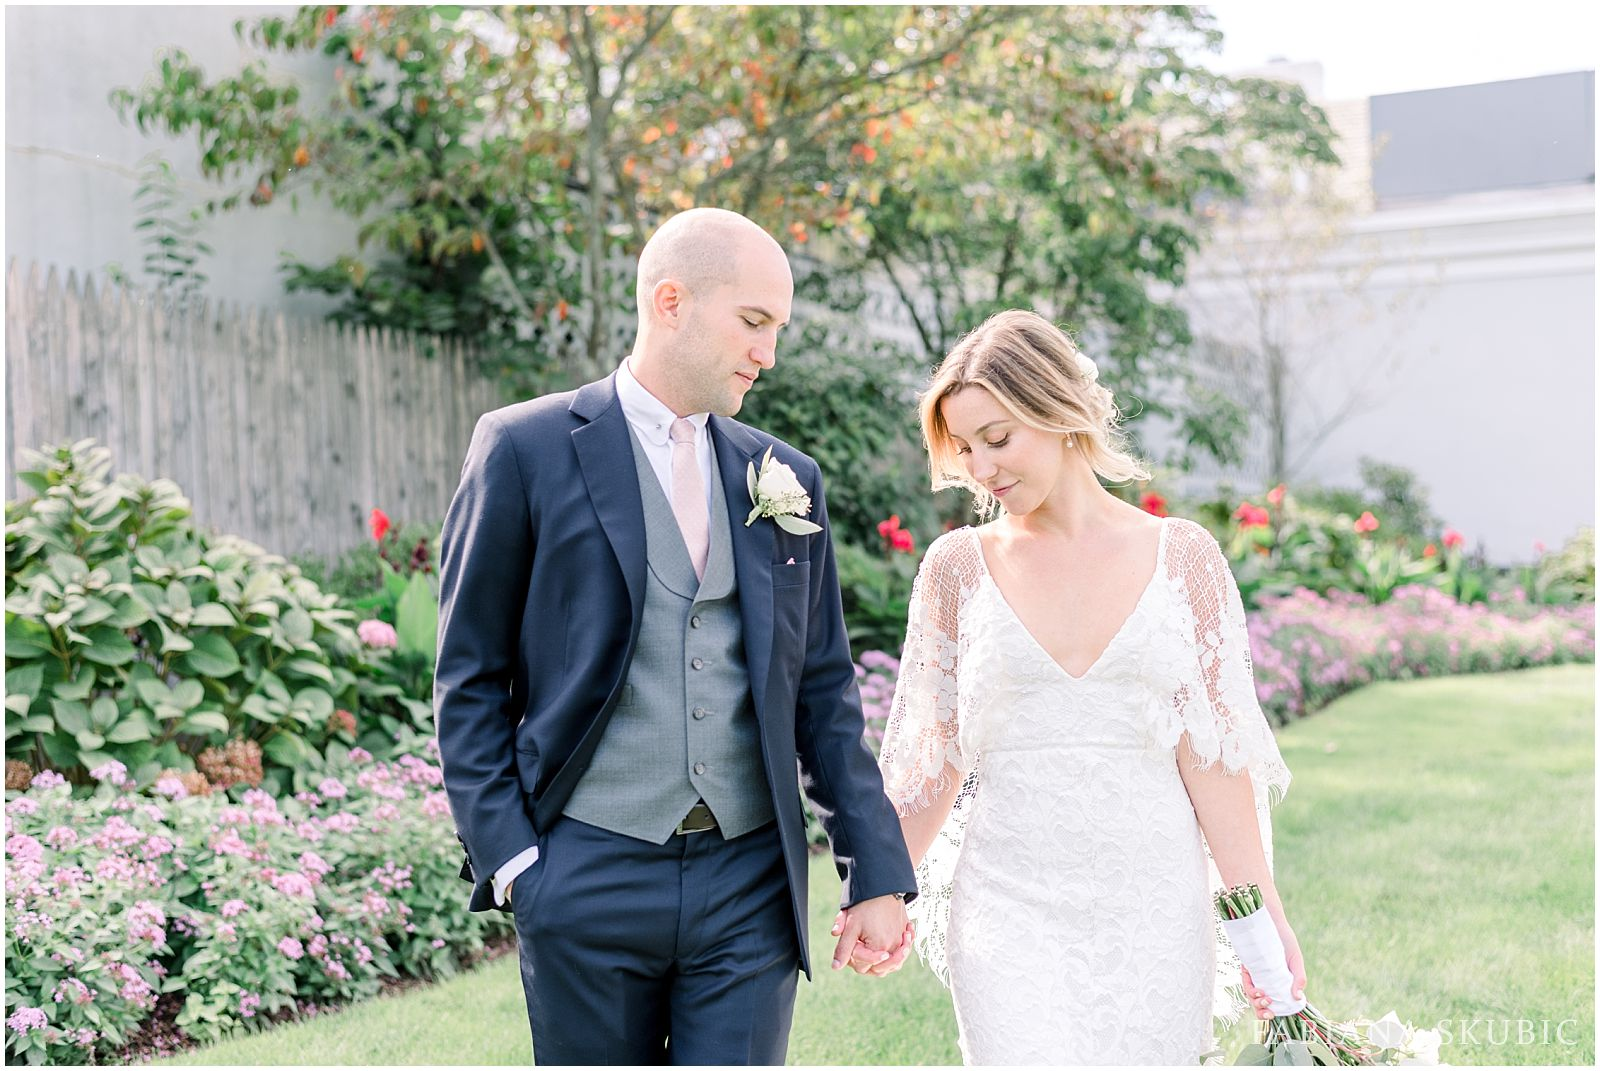 FabianaSkubic_H&M_Wedding_0032.jpg